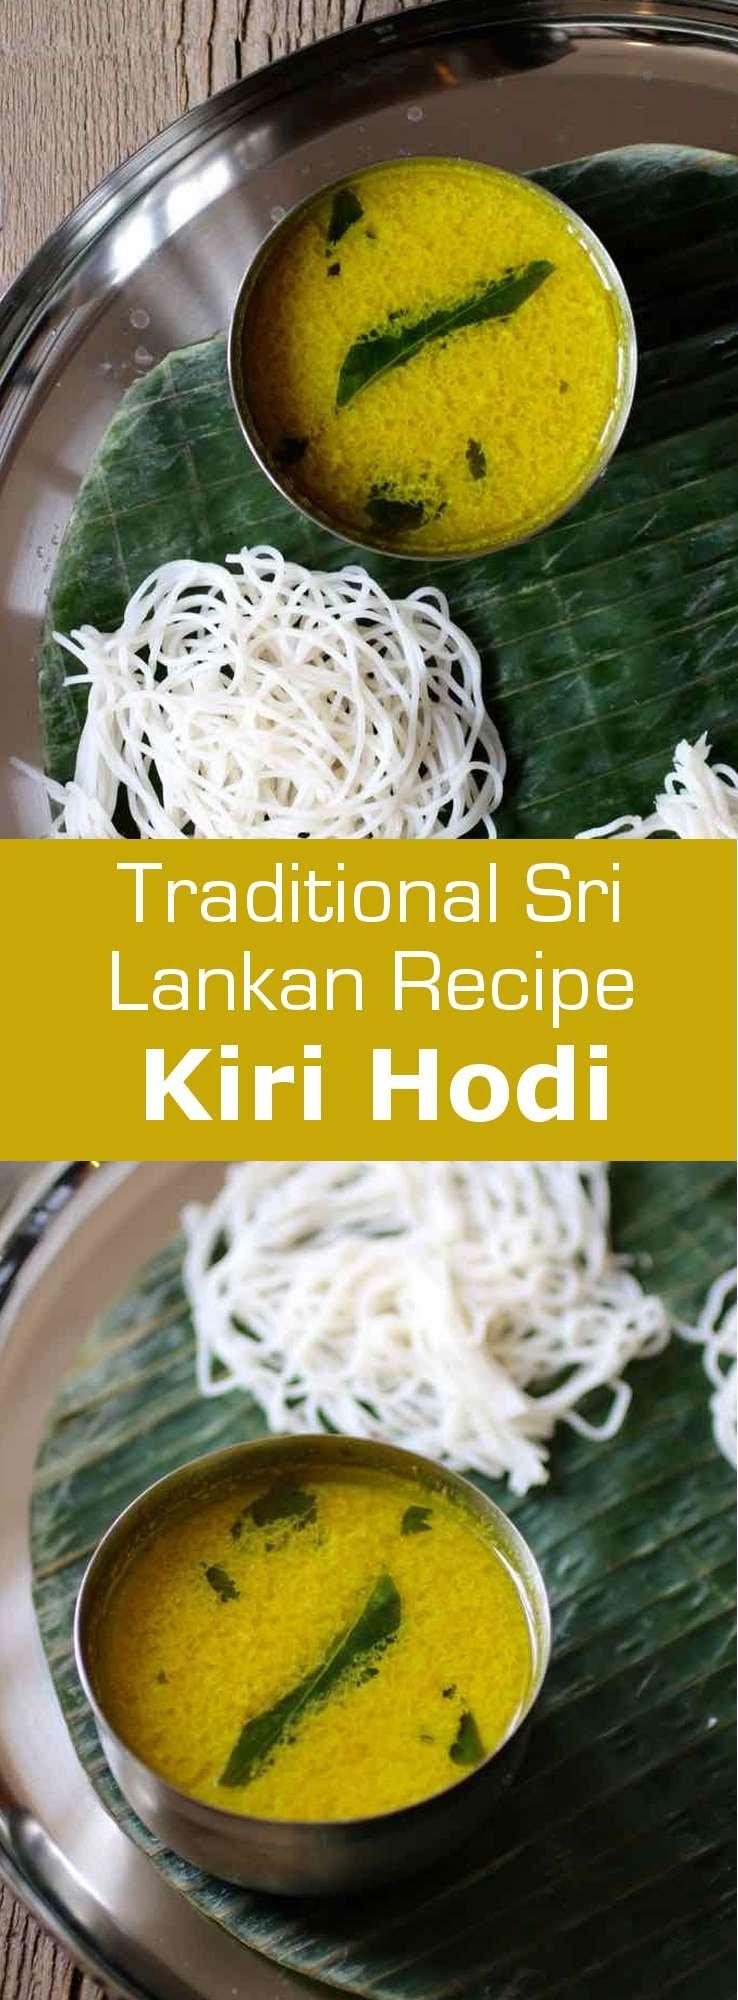 Kiri hodi is a popular and traditional fragrant coconut milk gravy from Sri Lanka. It is traditionally served hot alongside coconut sambol or string hoppers. #SriLanka #SriLankanCuisine #SriLankanCurry #SriLankanRecipe #WorldCuisine #196flavors